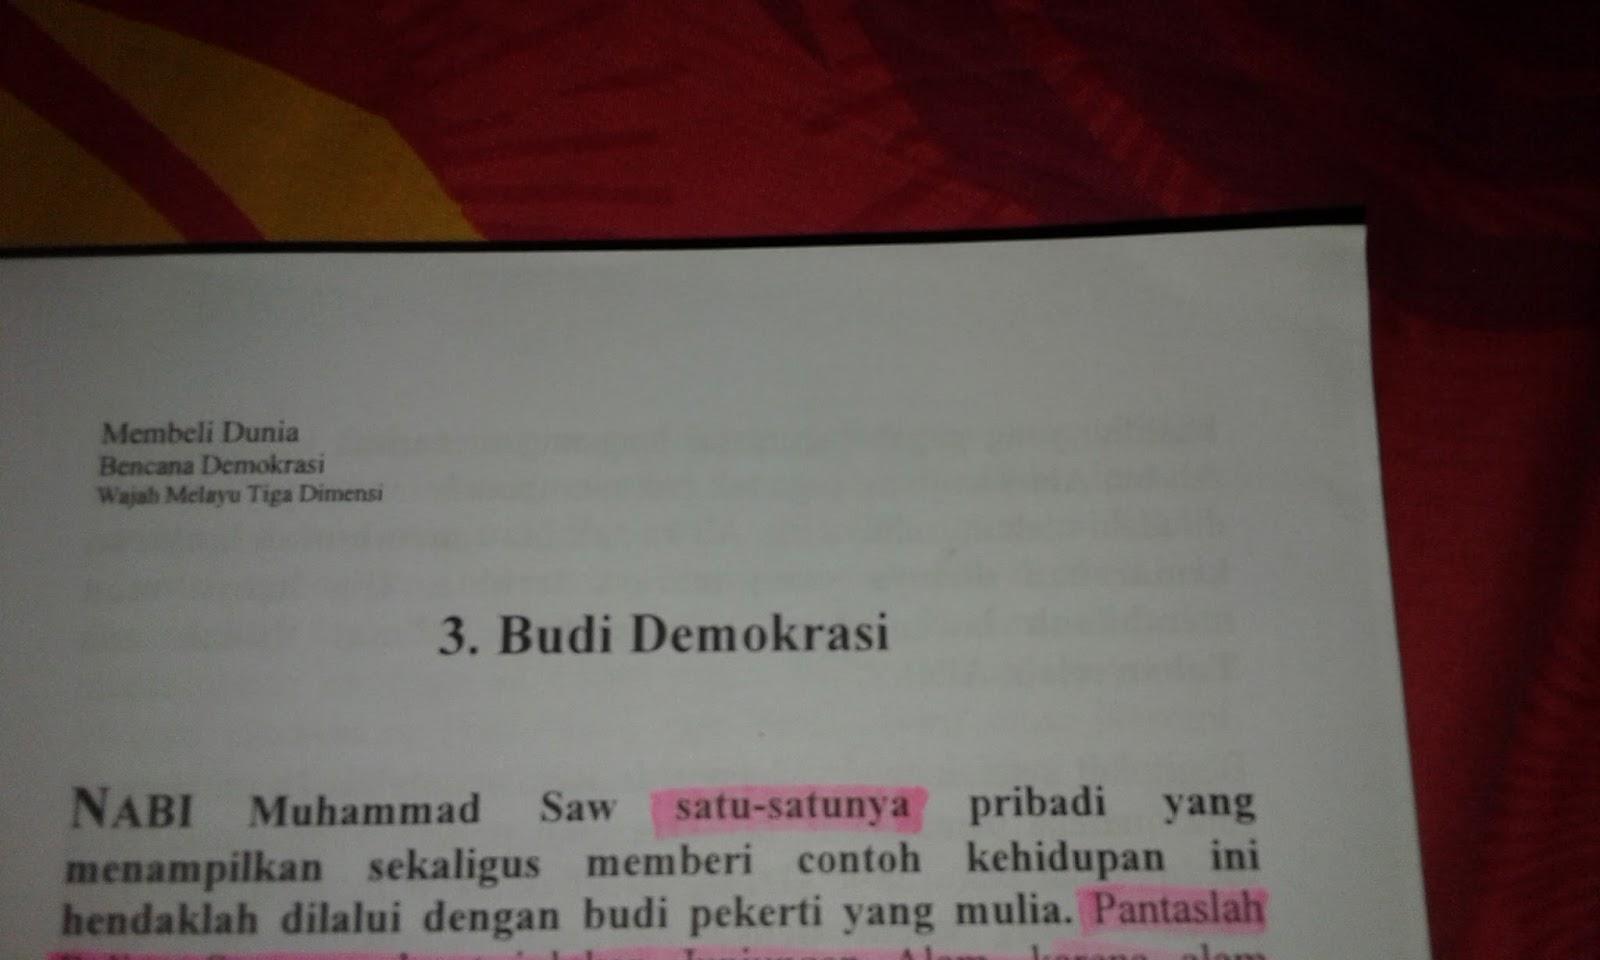 Tugas 2 Sintaksis Bahasa Indonesia Menganalisis Buku Pak Uu Hamidy